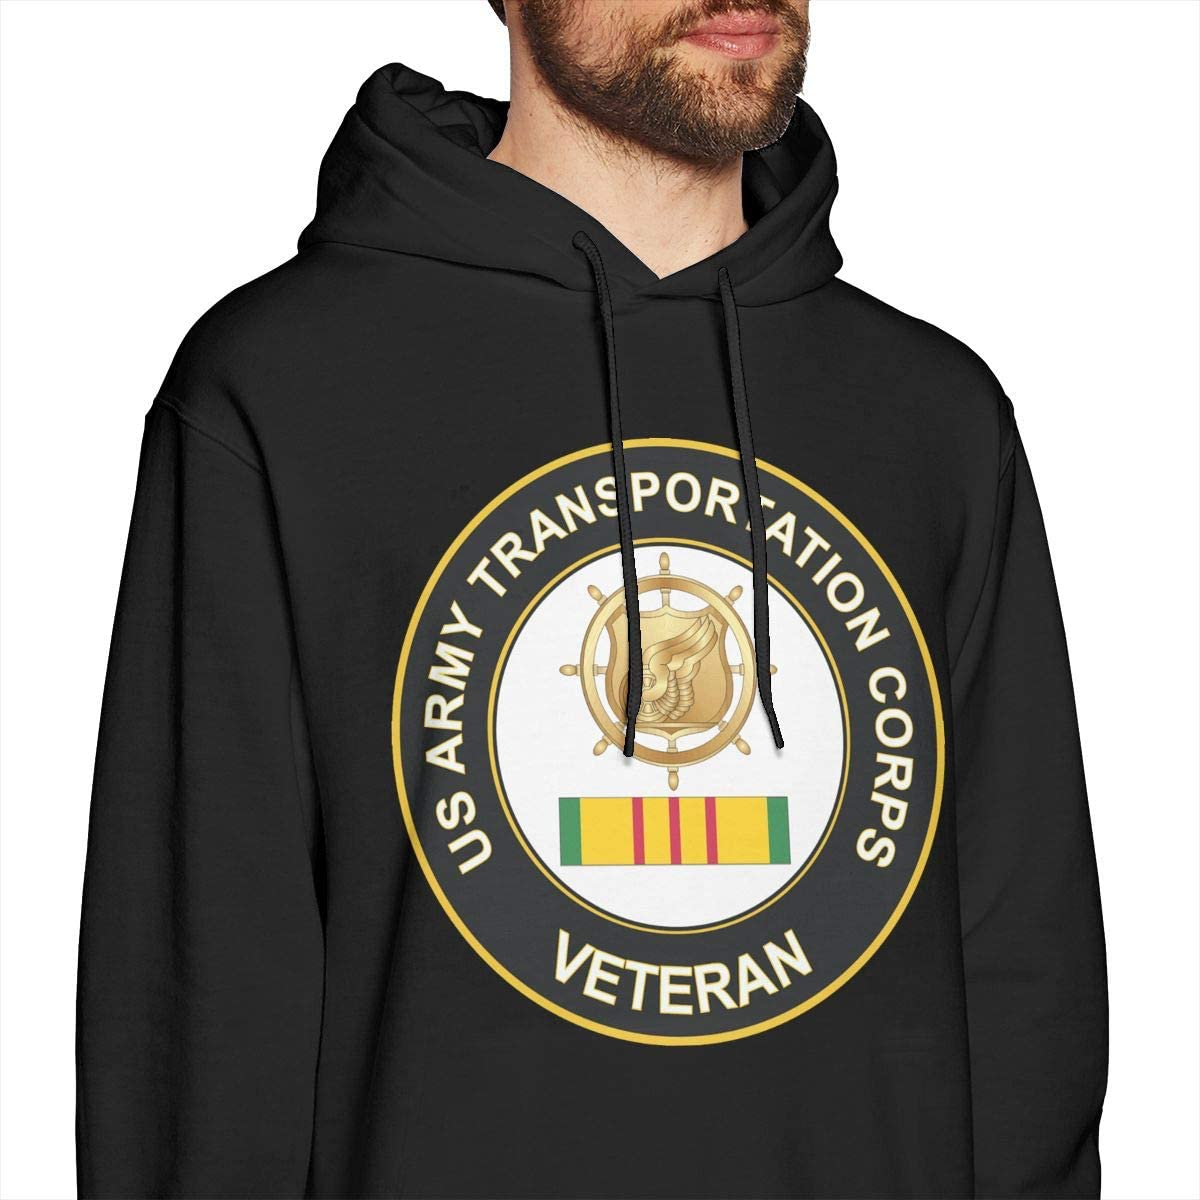 HONGHUOmao US Army Transportation Corps Vietnam Veteran Mens Fashion Pullover Casual Hoodie Hooded Sweatshirt with Pocket